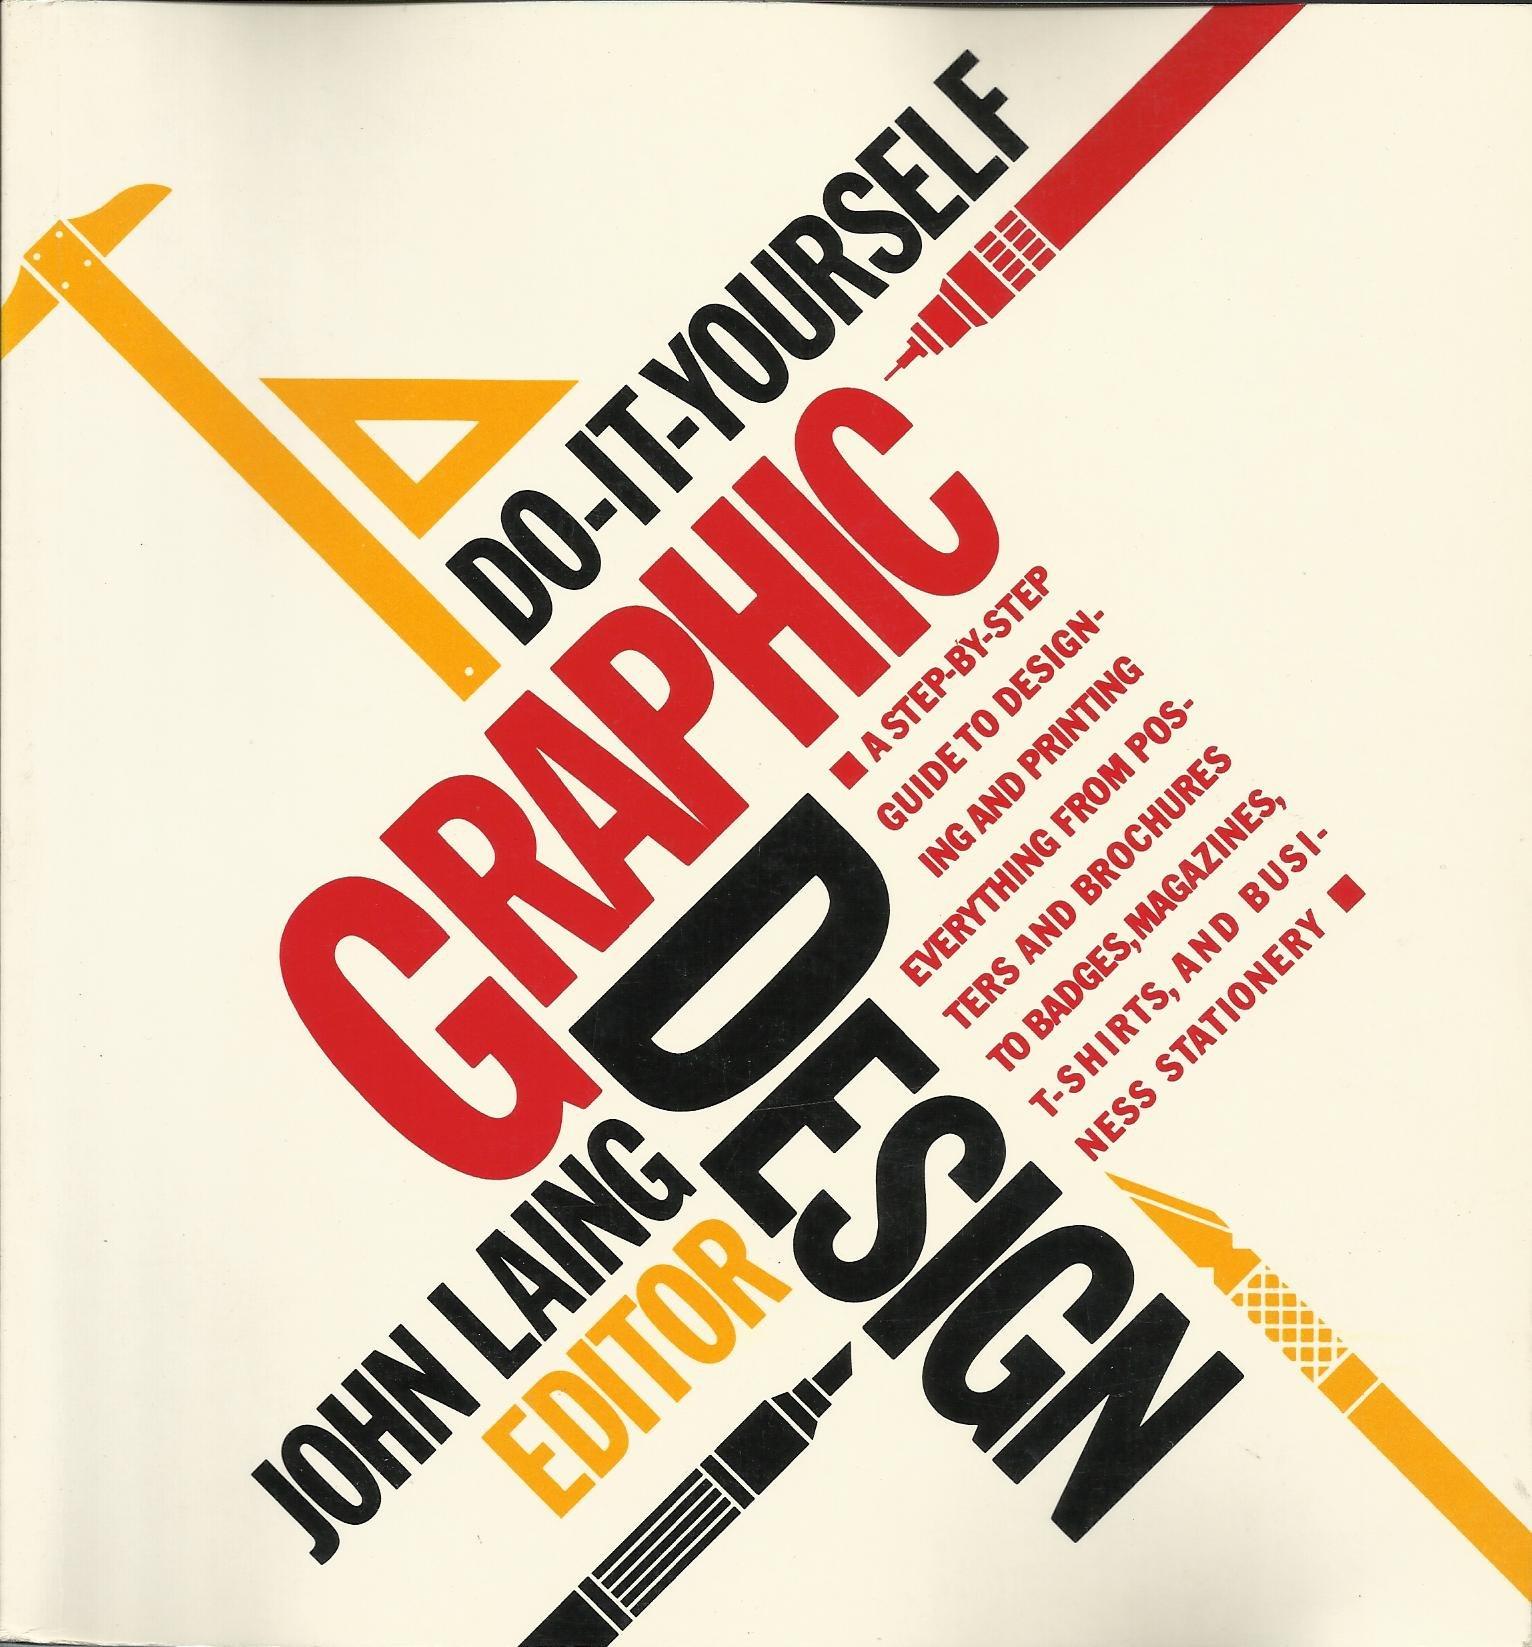 Do it yourself graphic design john laing 9780020115502 amazon do it yourself graphic design john laing 9780020115502 amazon books solutioingenieria Choice Image